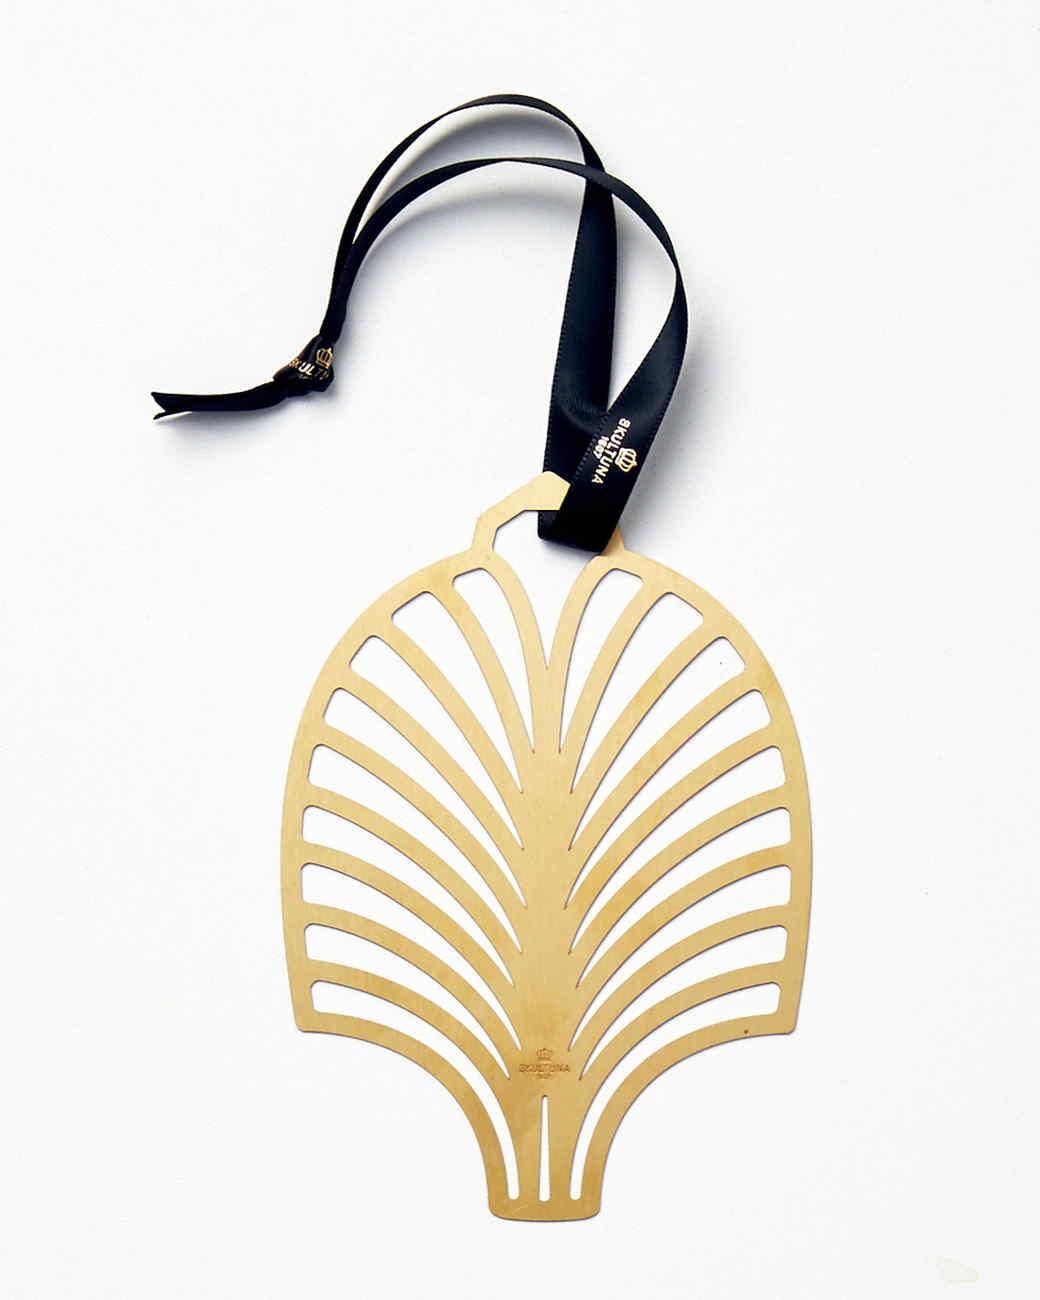 skultuna-ornaments-gold-068-d112494.jpg